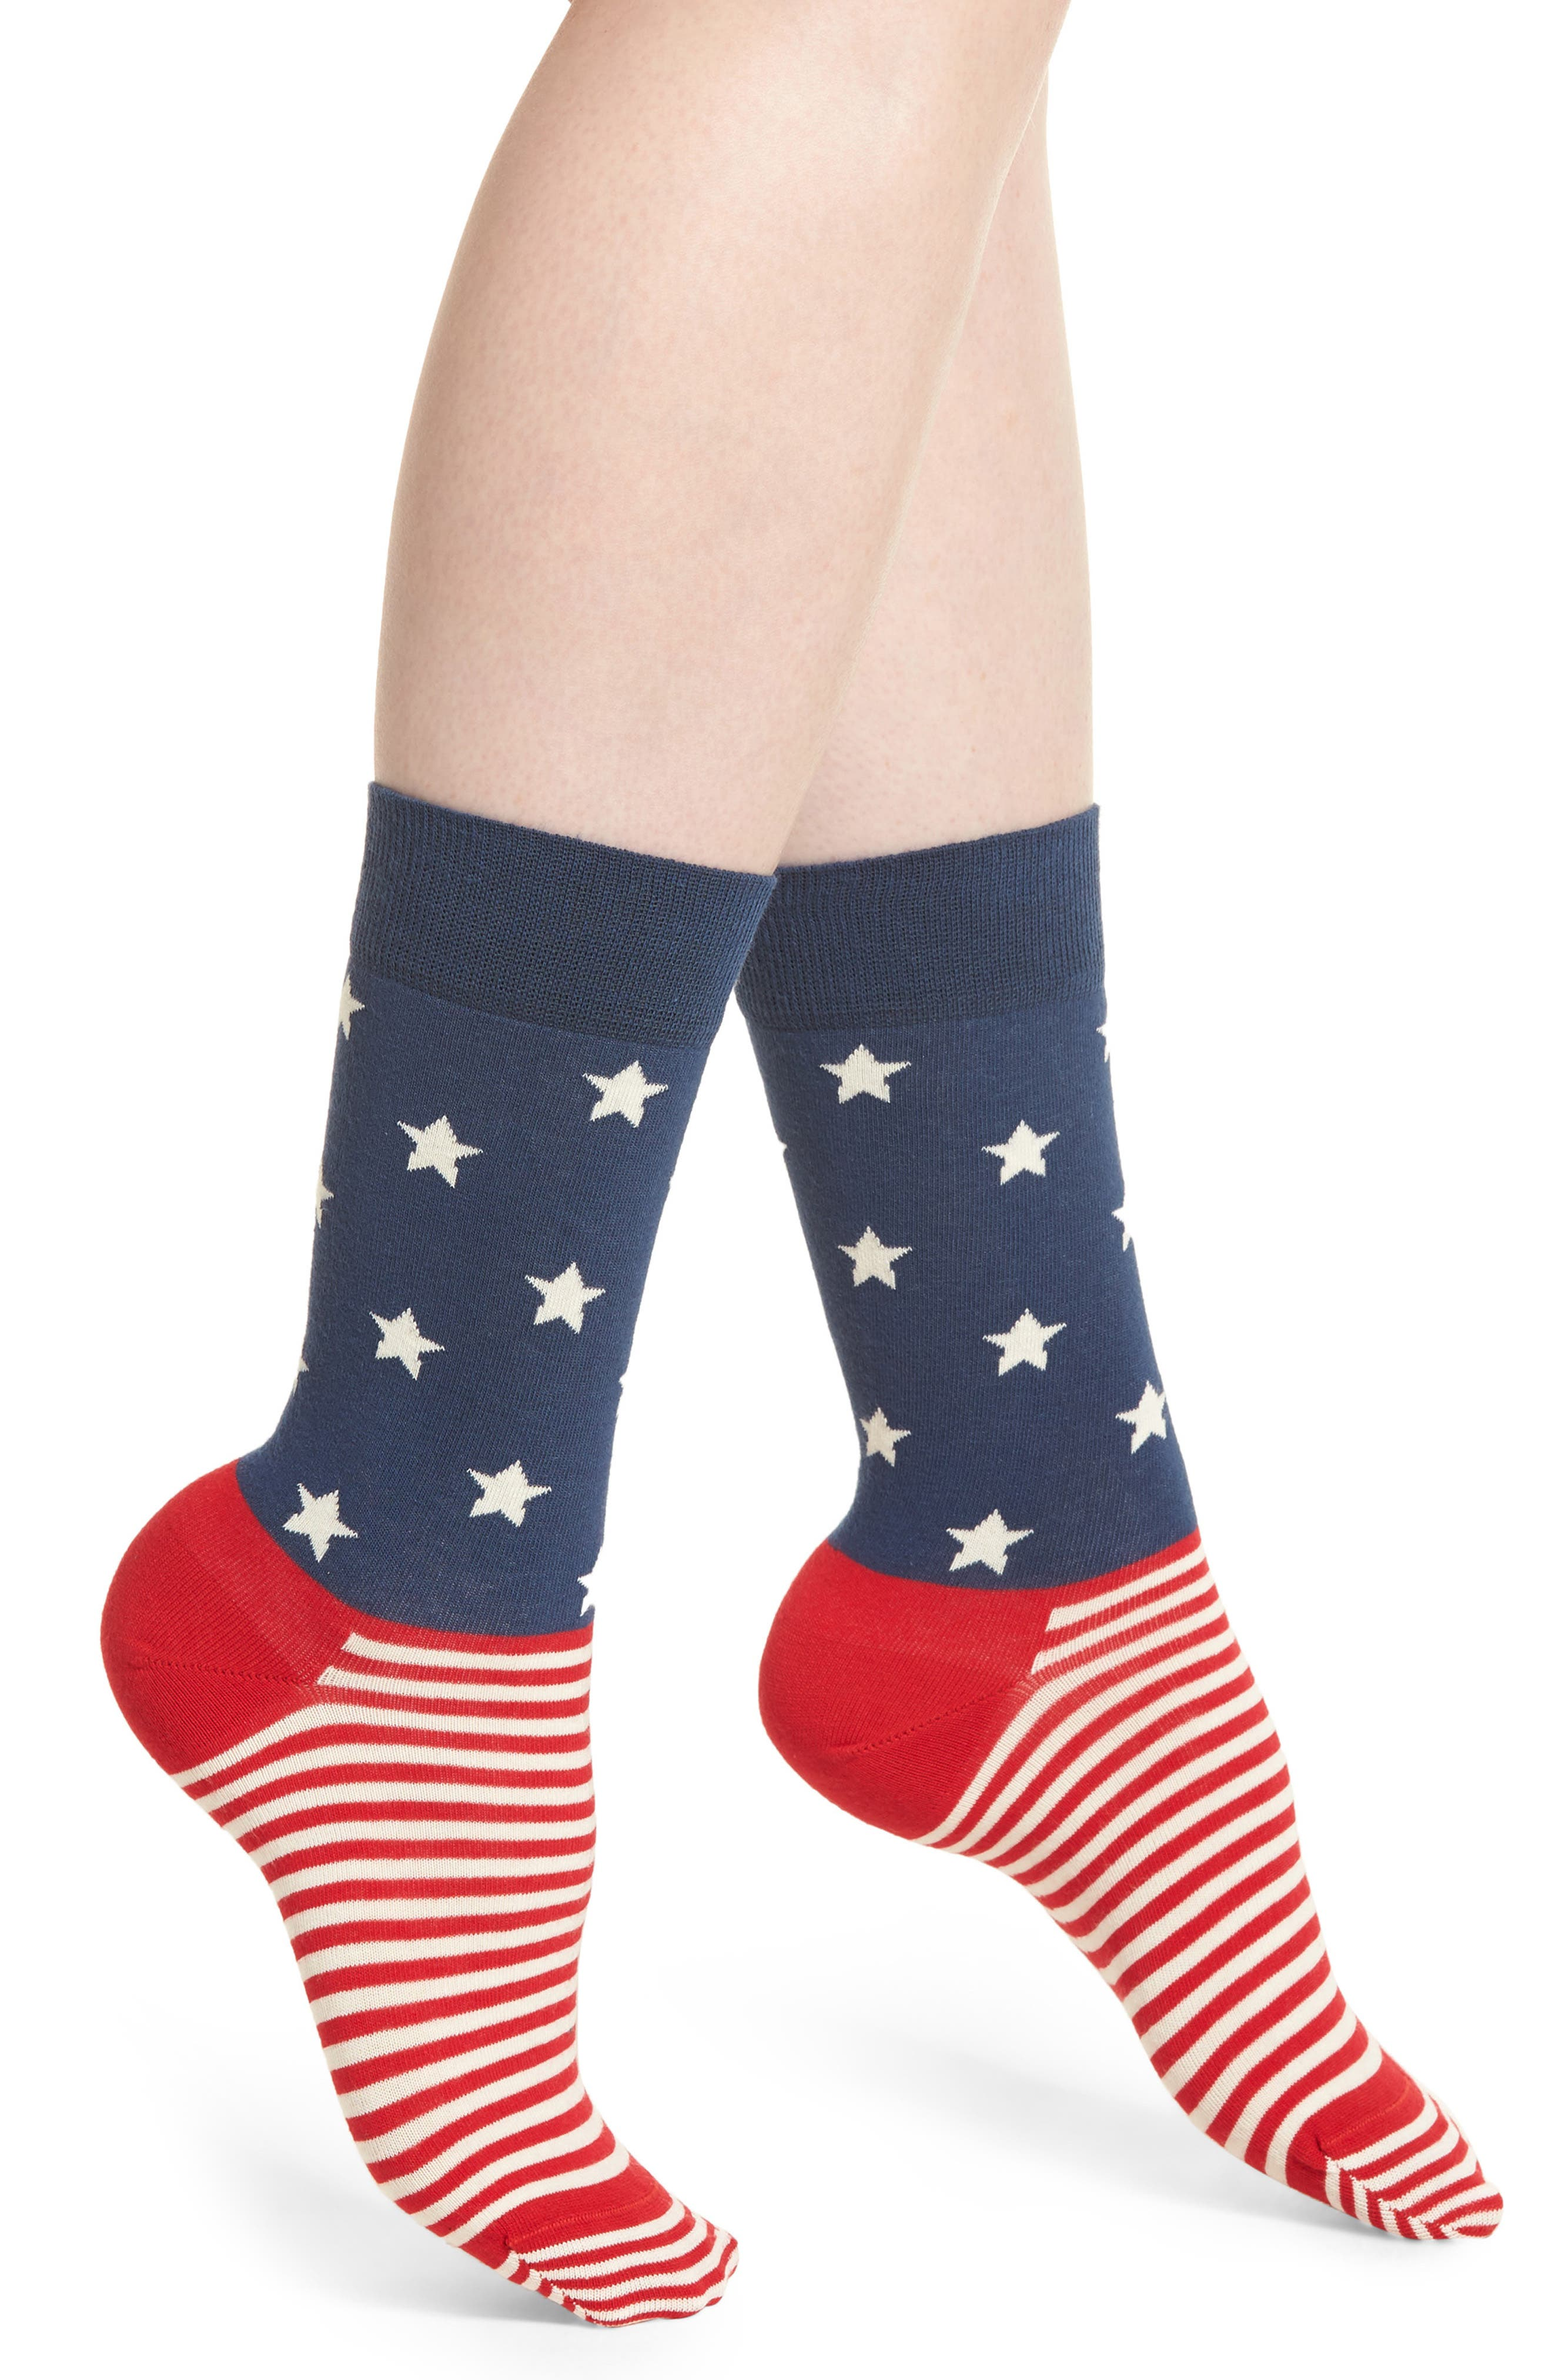 Stars & Stripes Crew Socks,                         Main,                         color, Blue